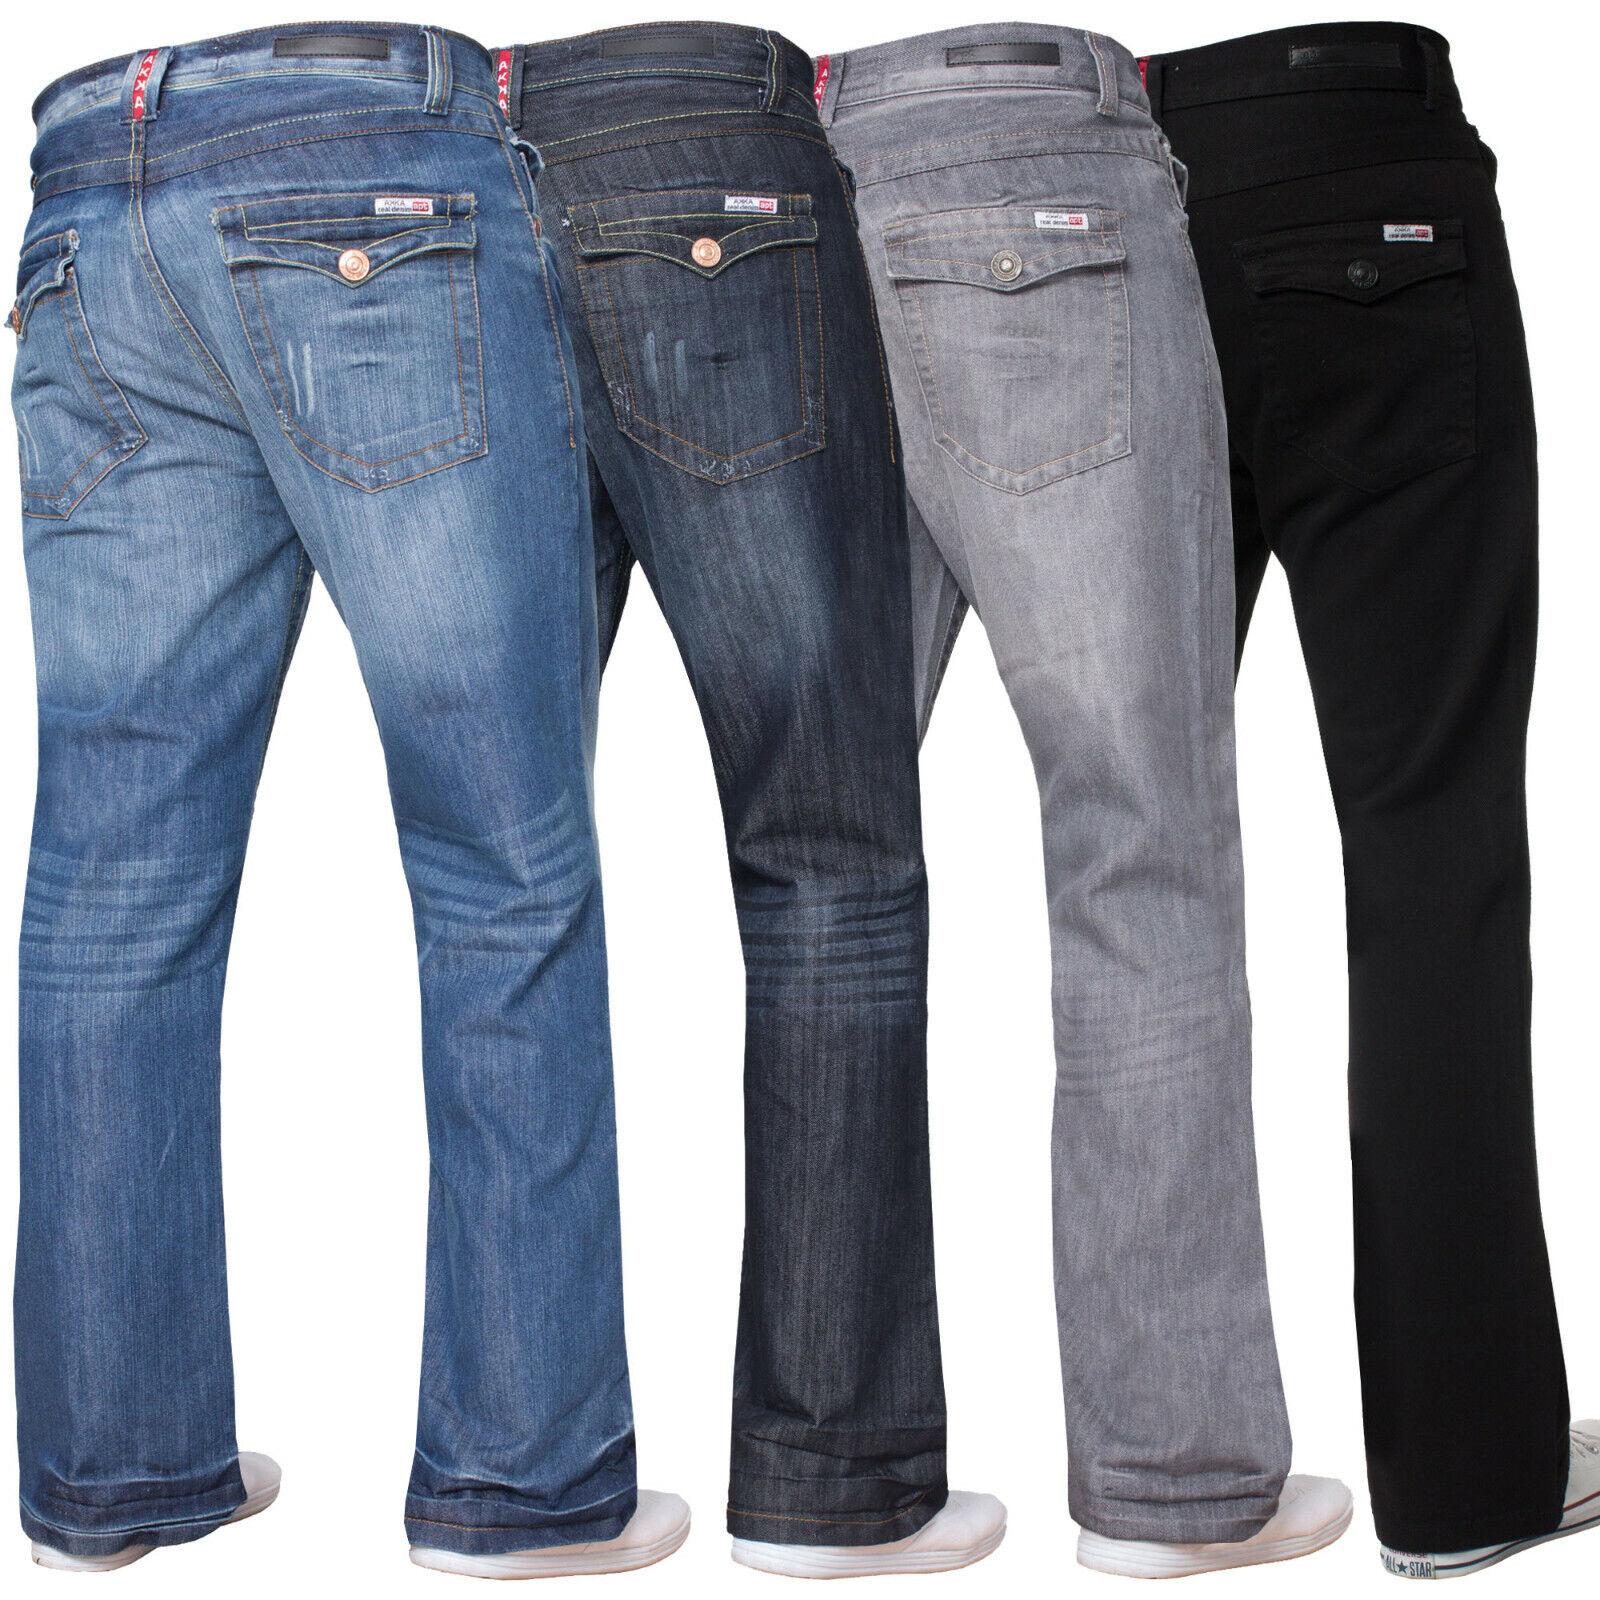 Uomo Bootcut Jeans Gamba Larga Svasato Lavoro Casual Originale apt Big Re Taglie